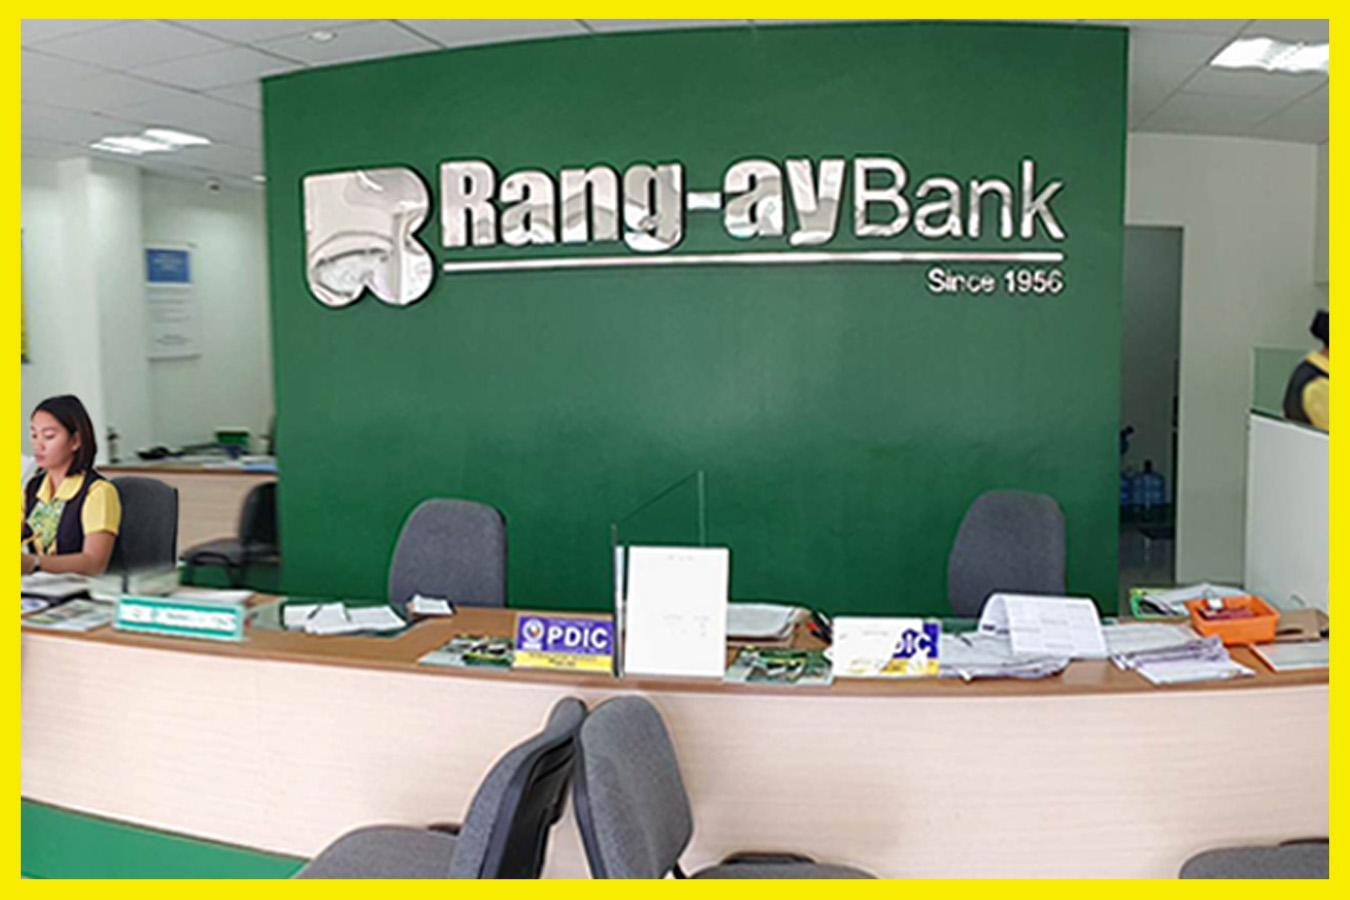 Inside view of the Rang-ay Bank Rosario (La Union) Branch